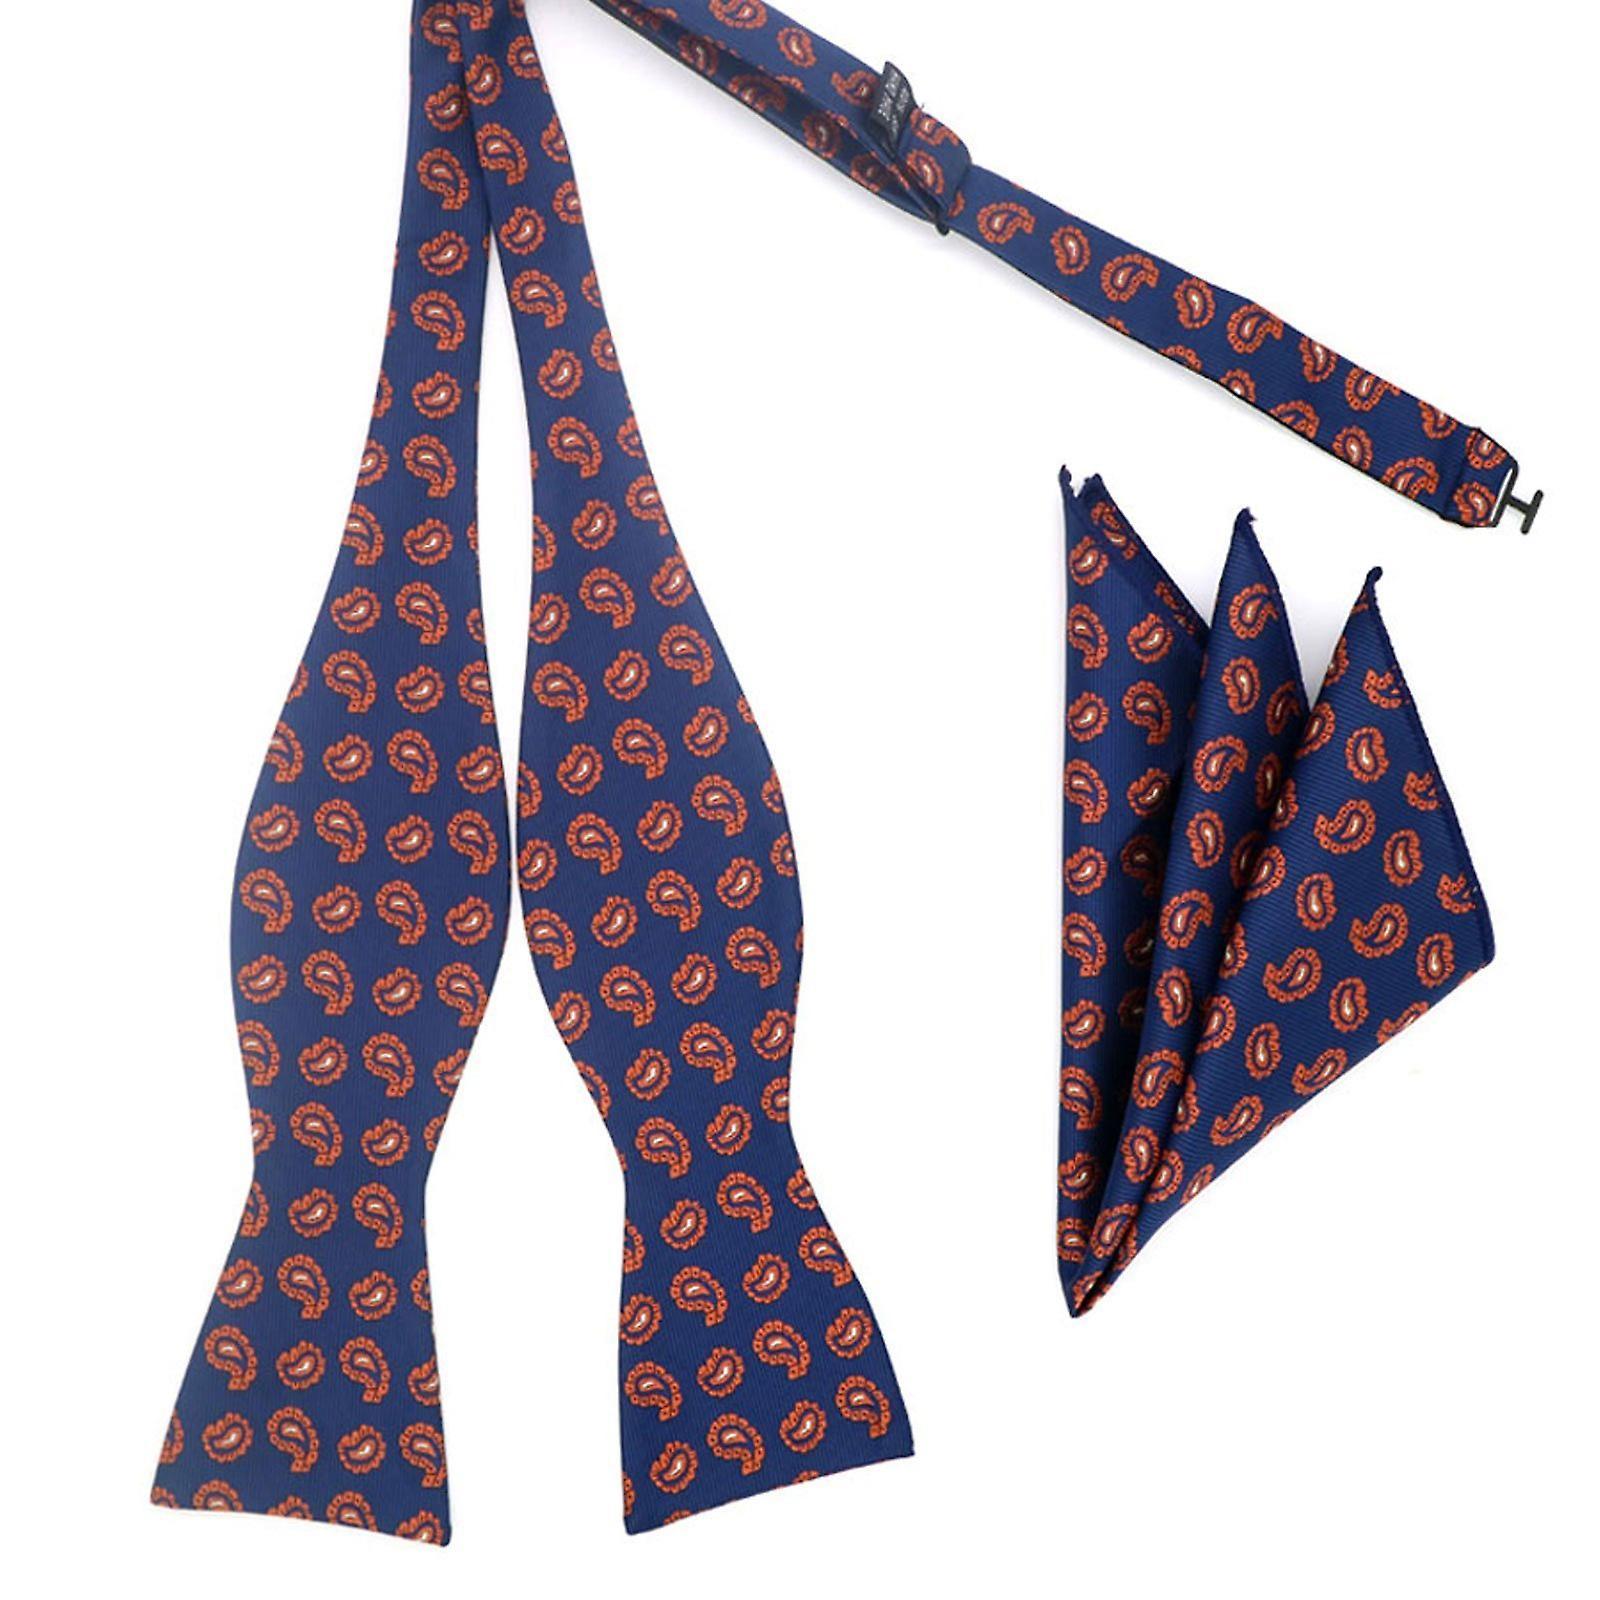 Navy blue & orange paisley self bow tie & pocket square